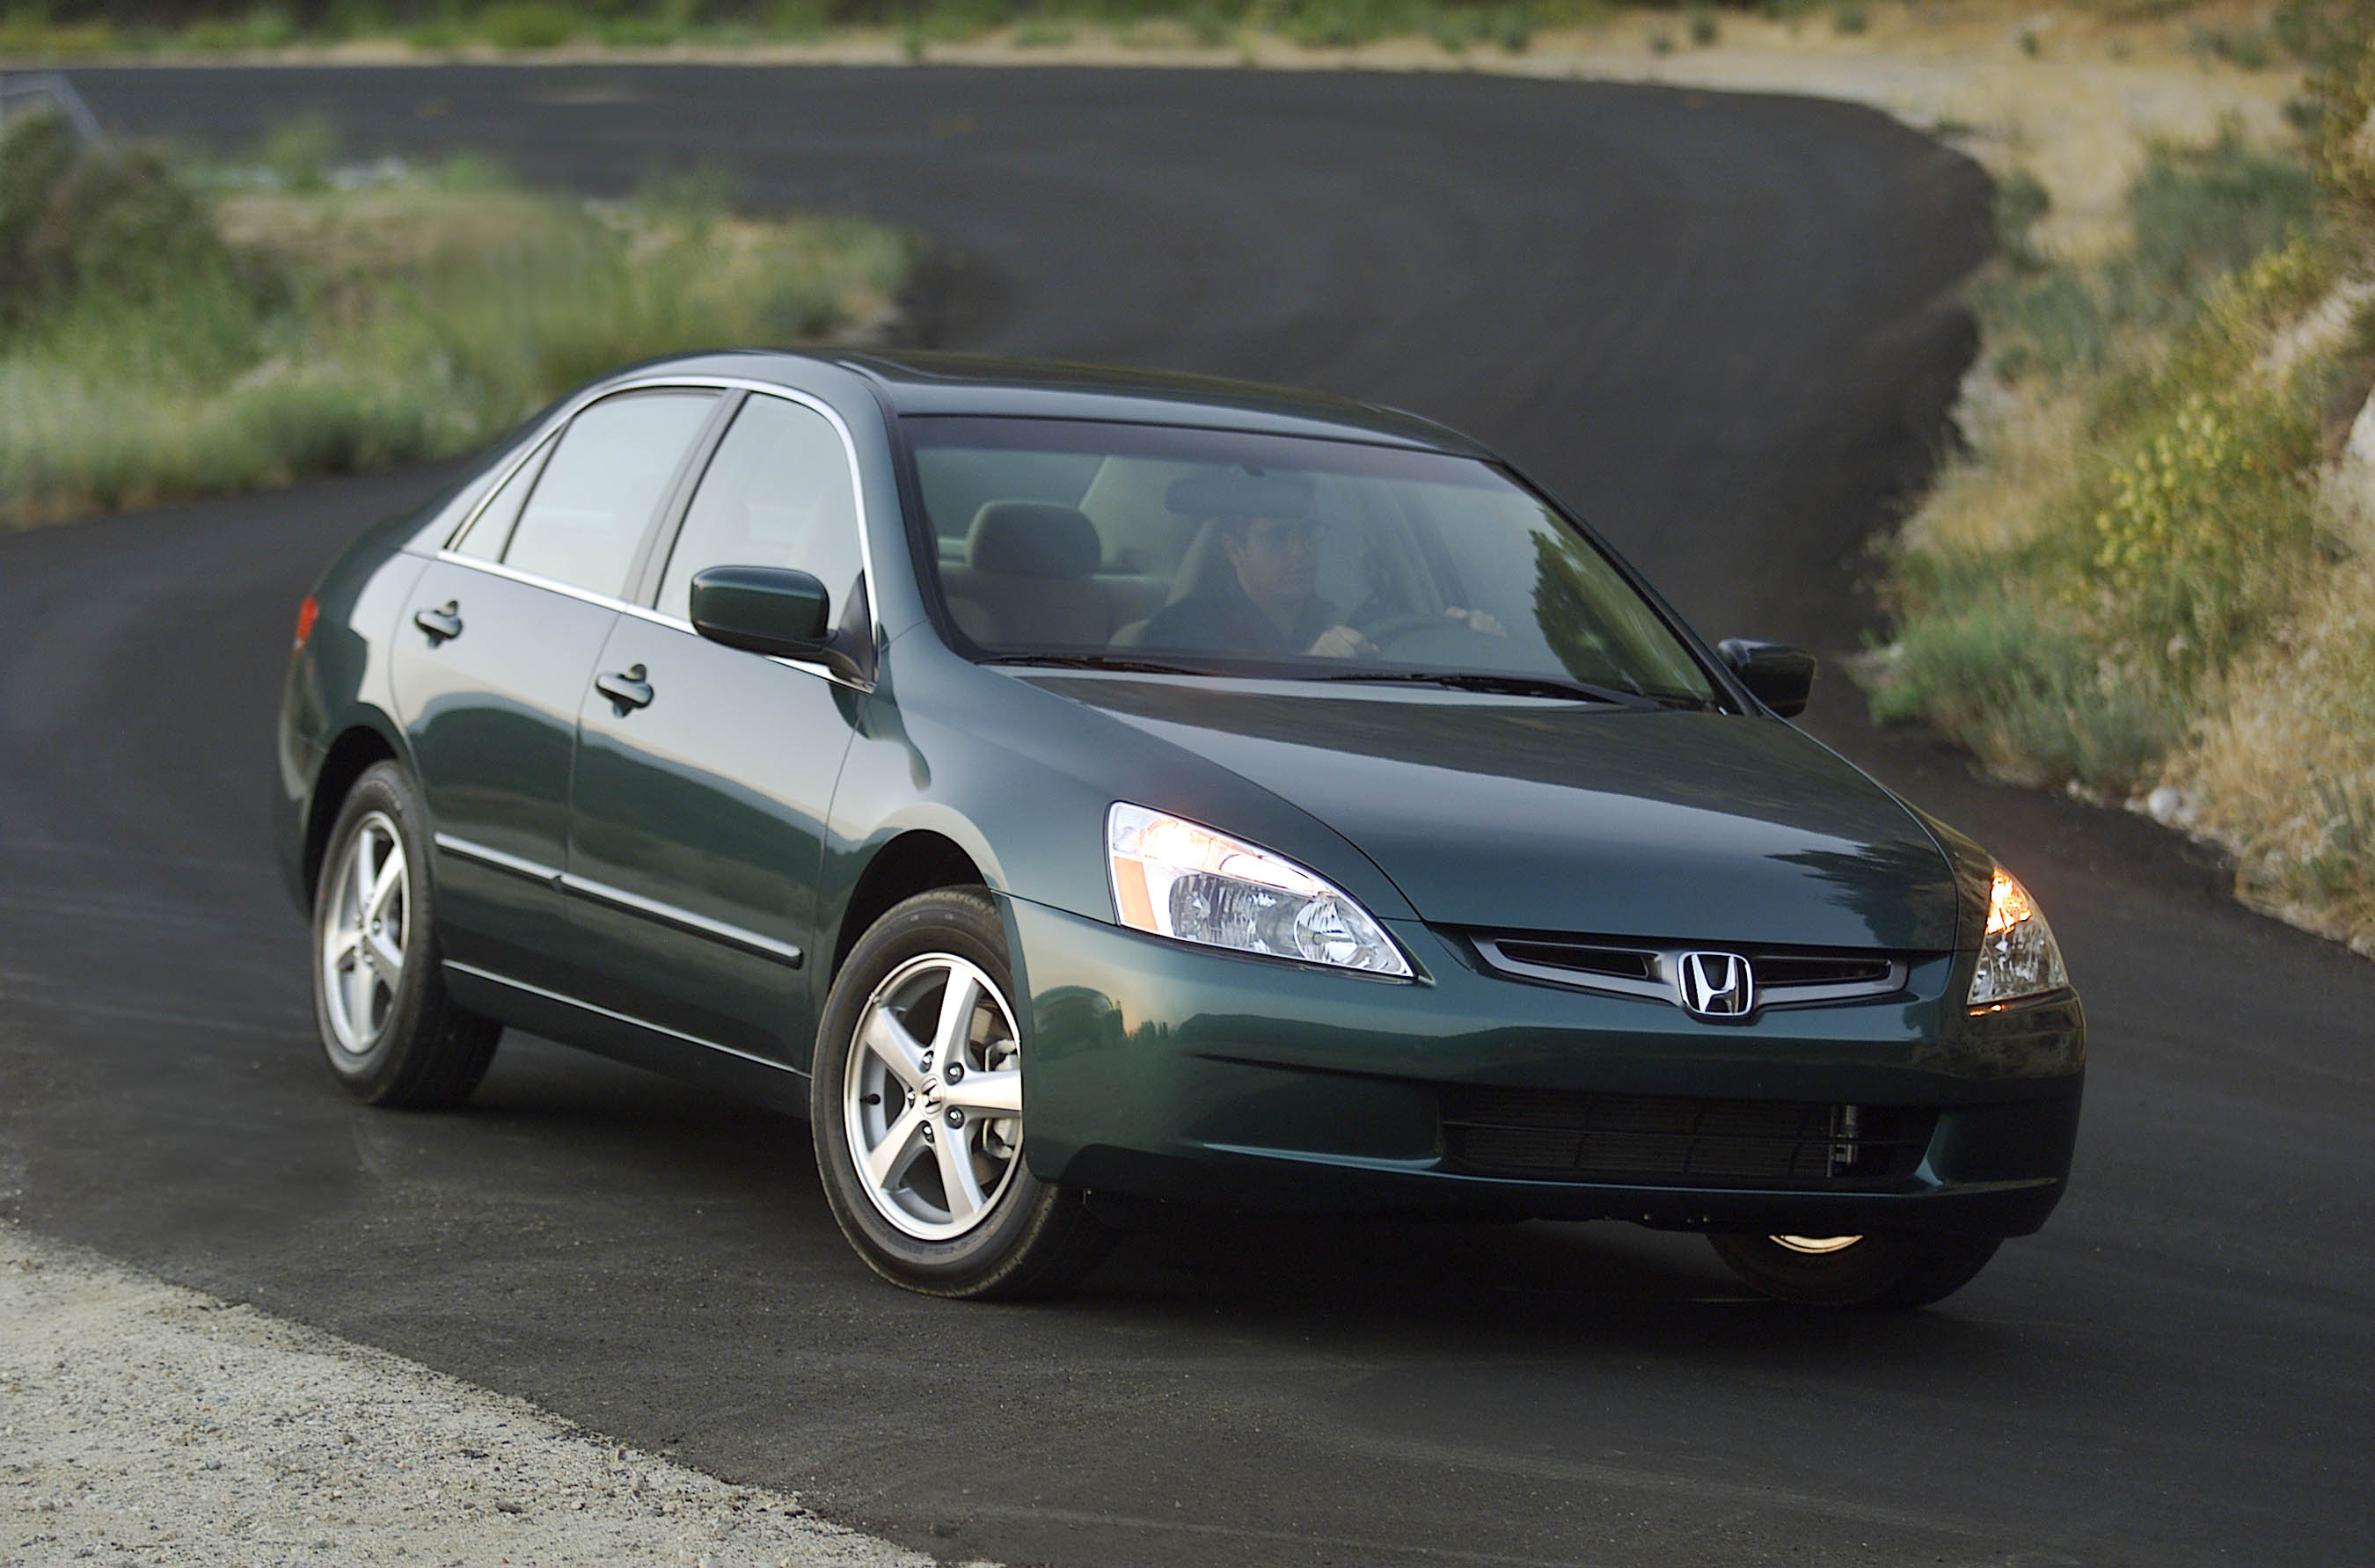 Honda Accord Sedan photo #1